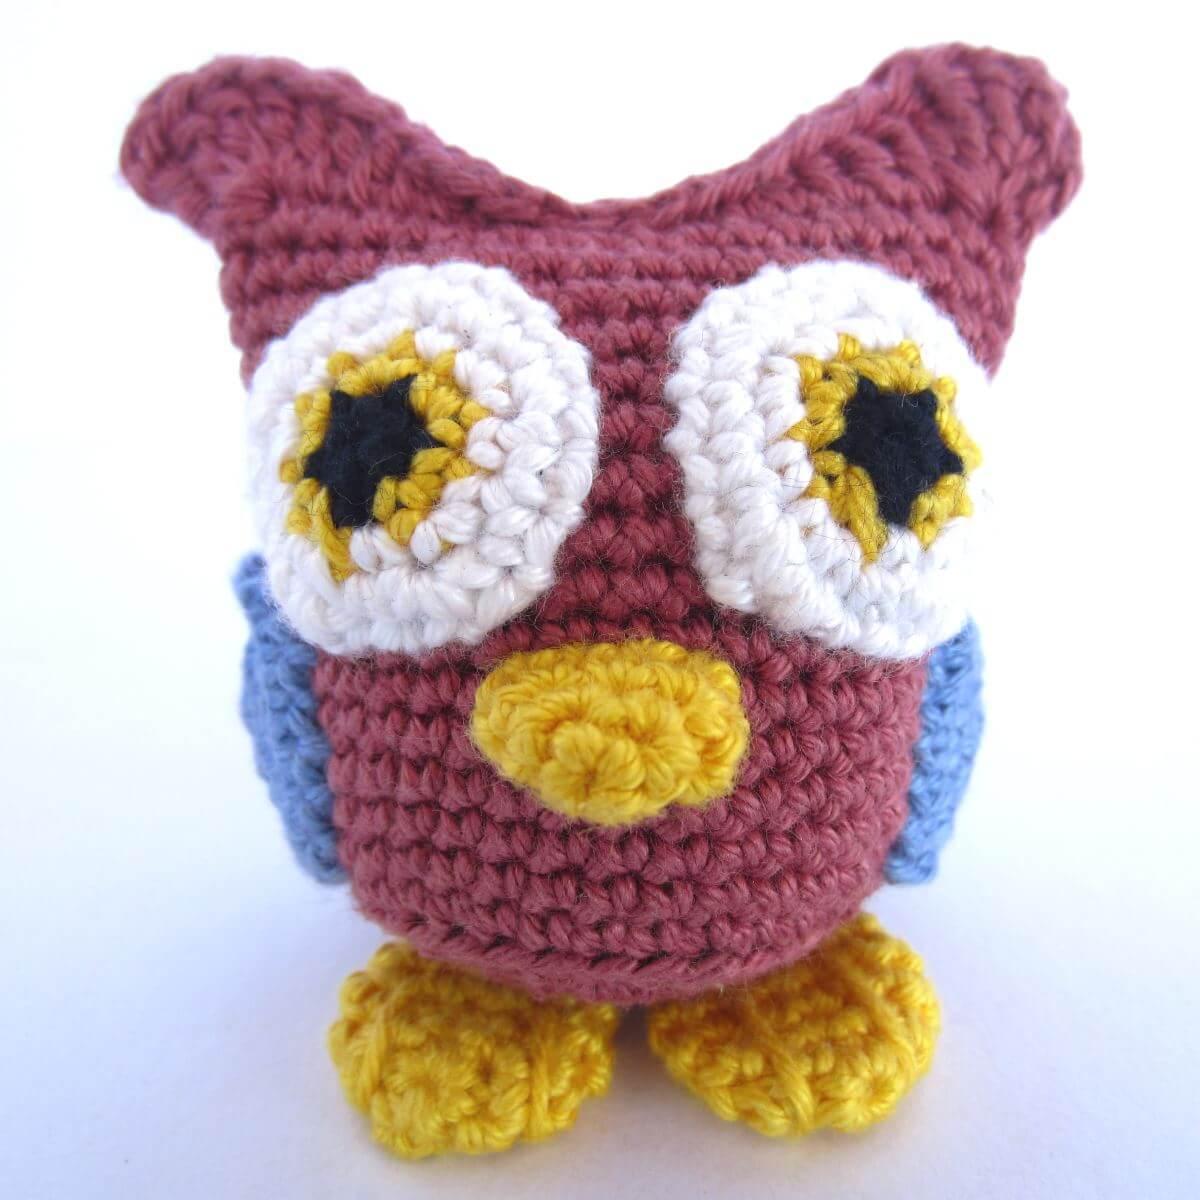 Amigurumi Crochet Owl Featured Image